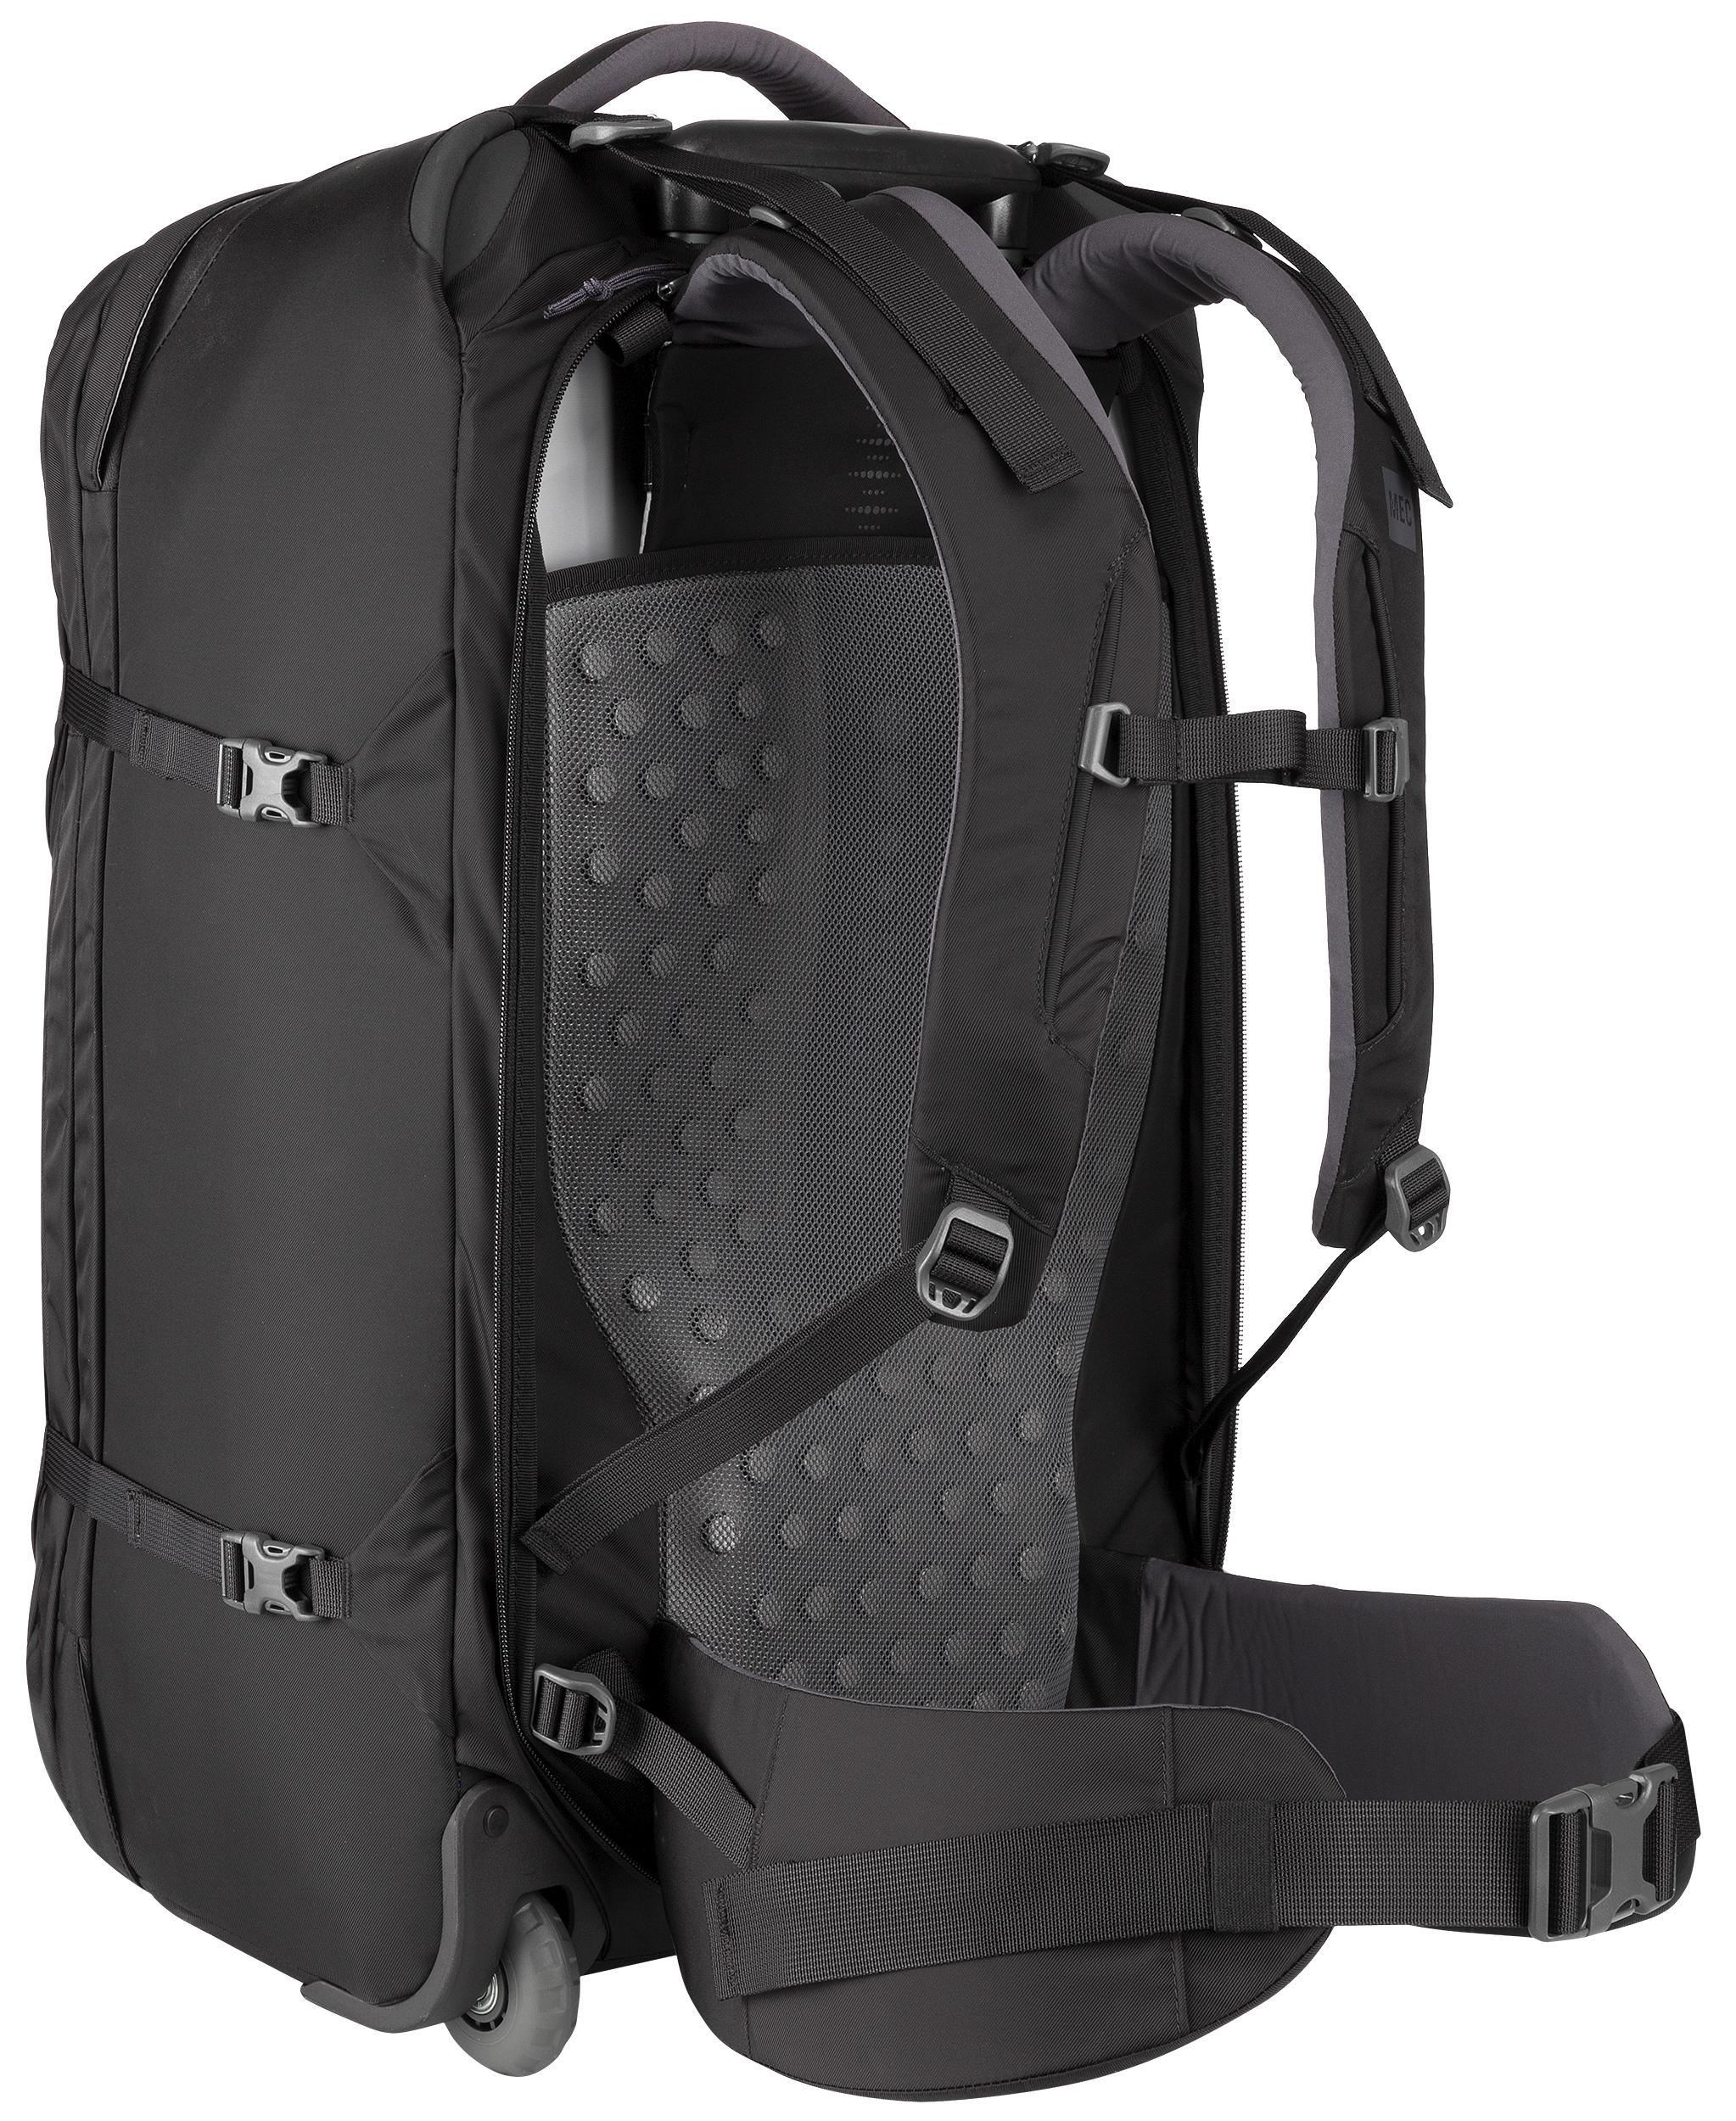 Mec Hiking Backpack Carrier Regreen Springfield